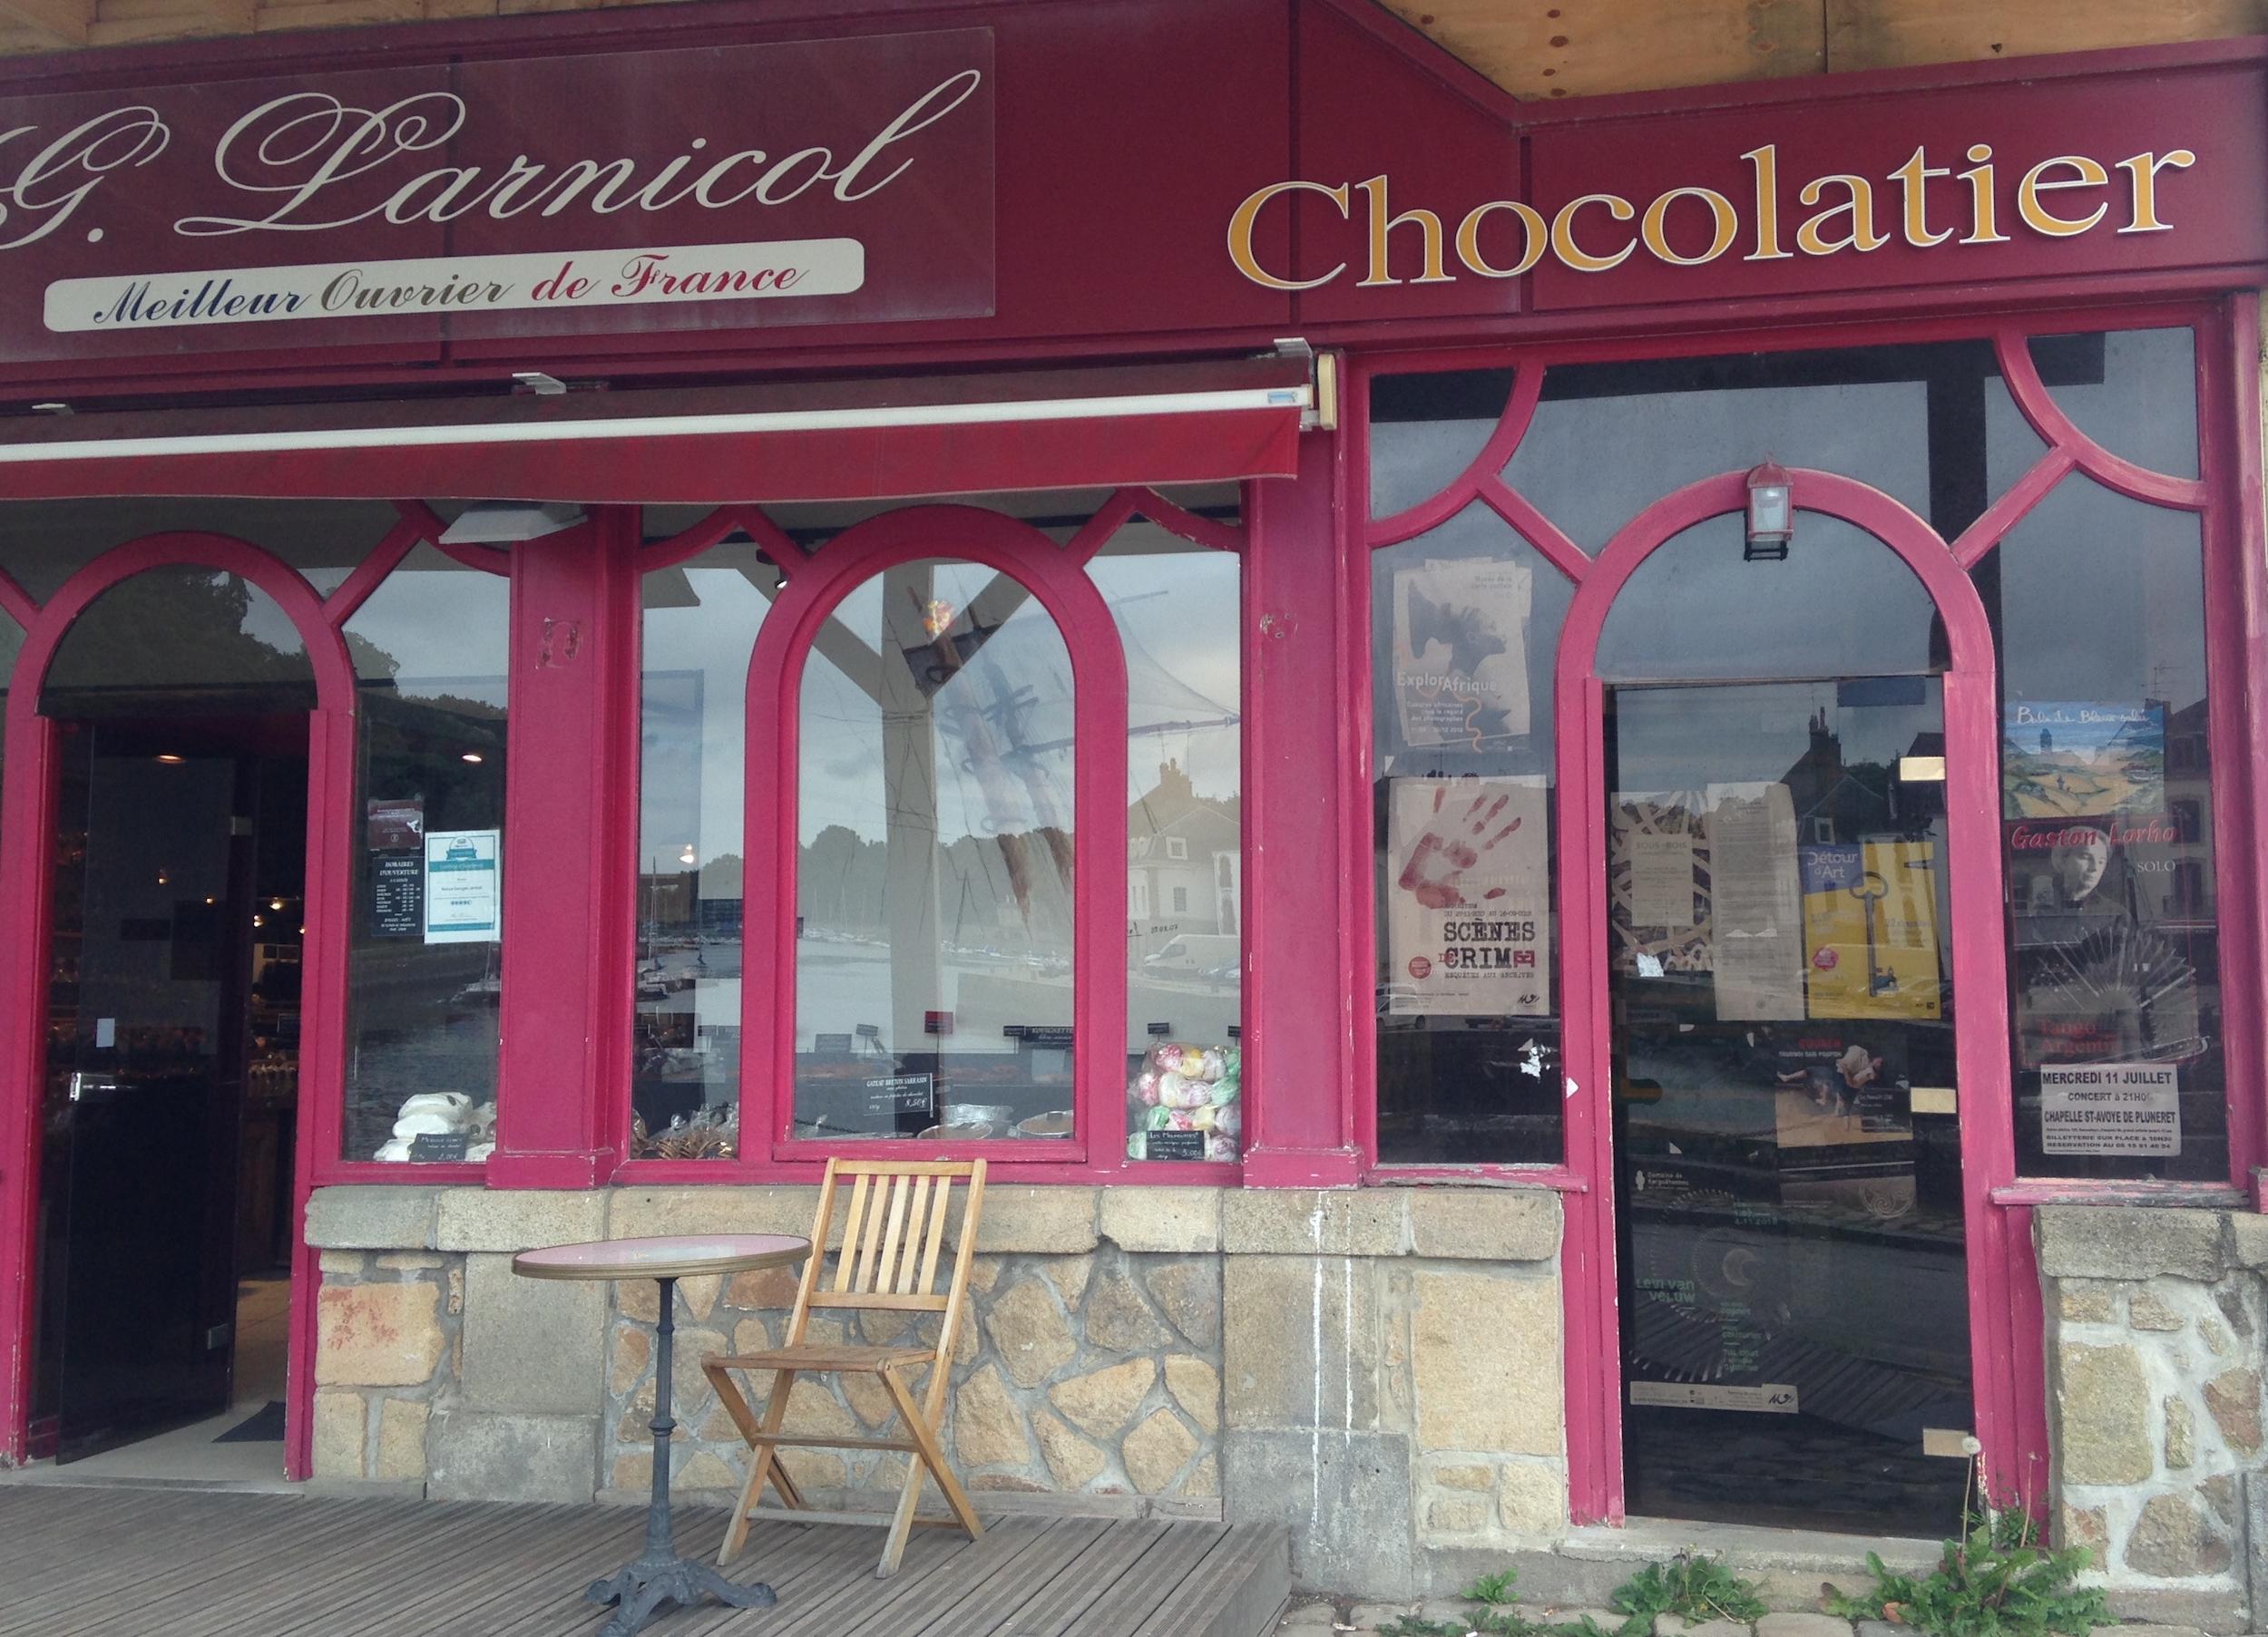 Une petitie chocolaterie in Bretagne, France